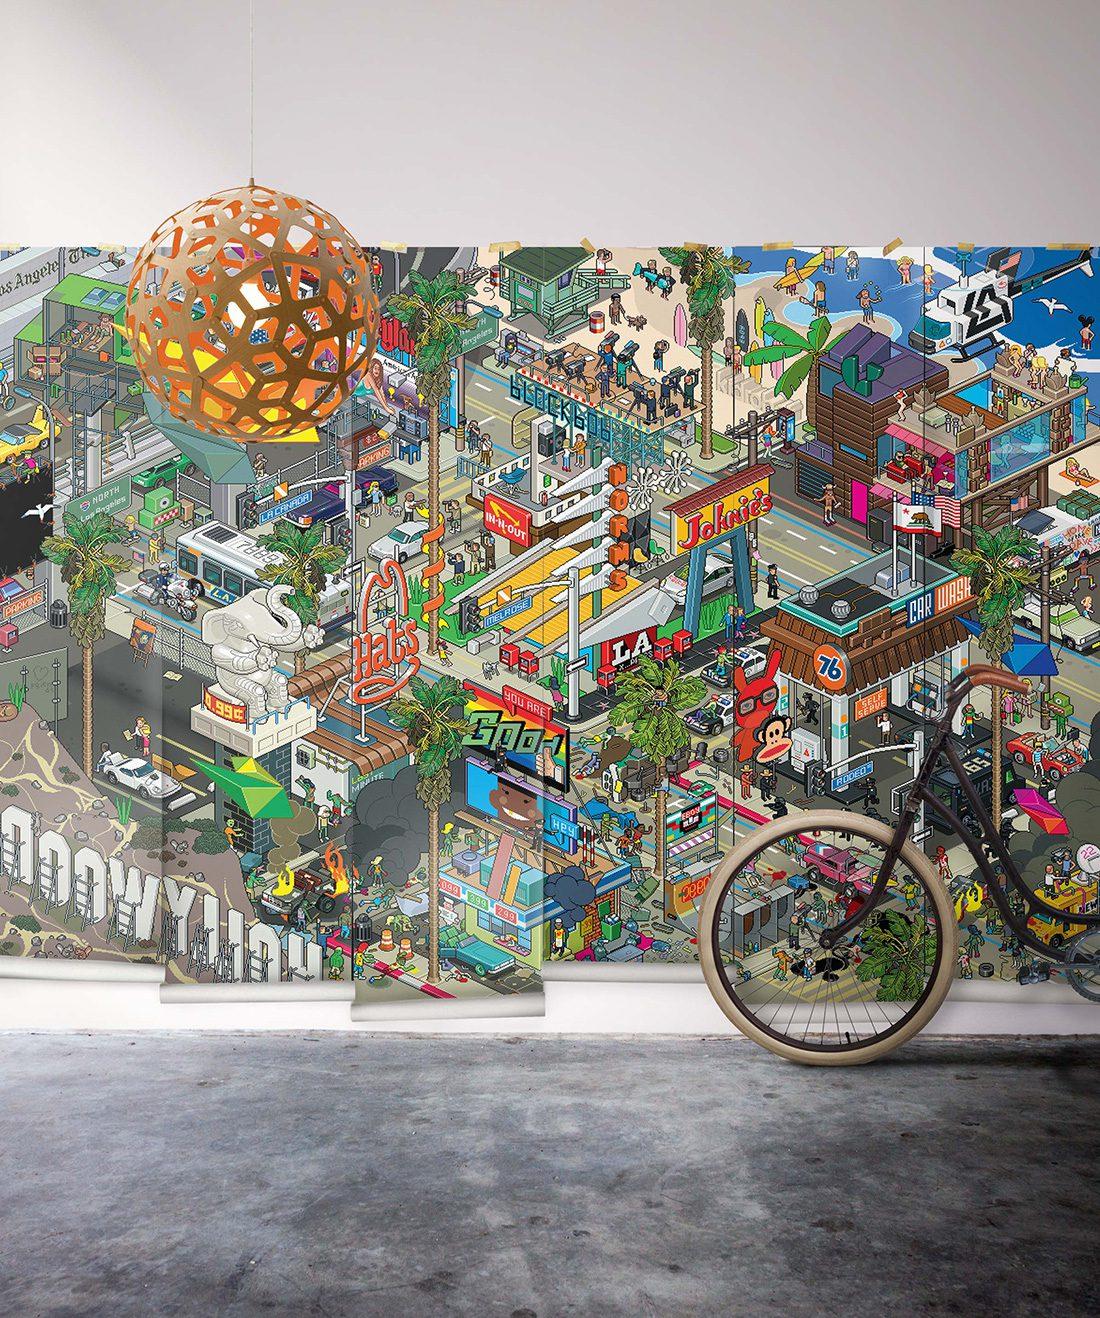 LA Wall Mural